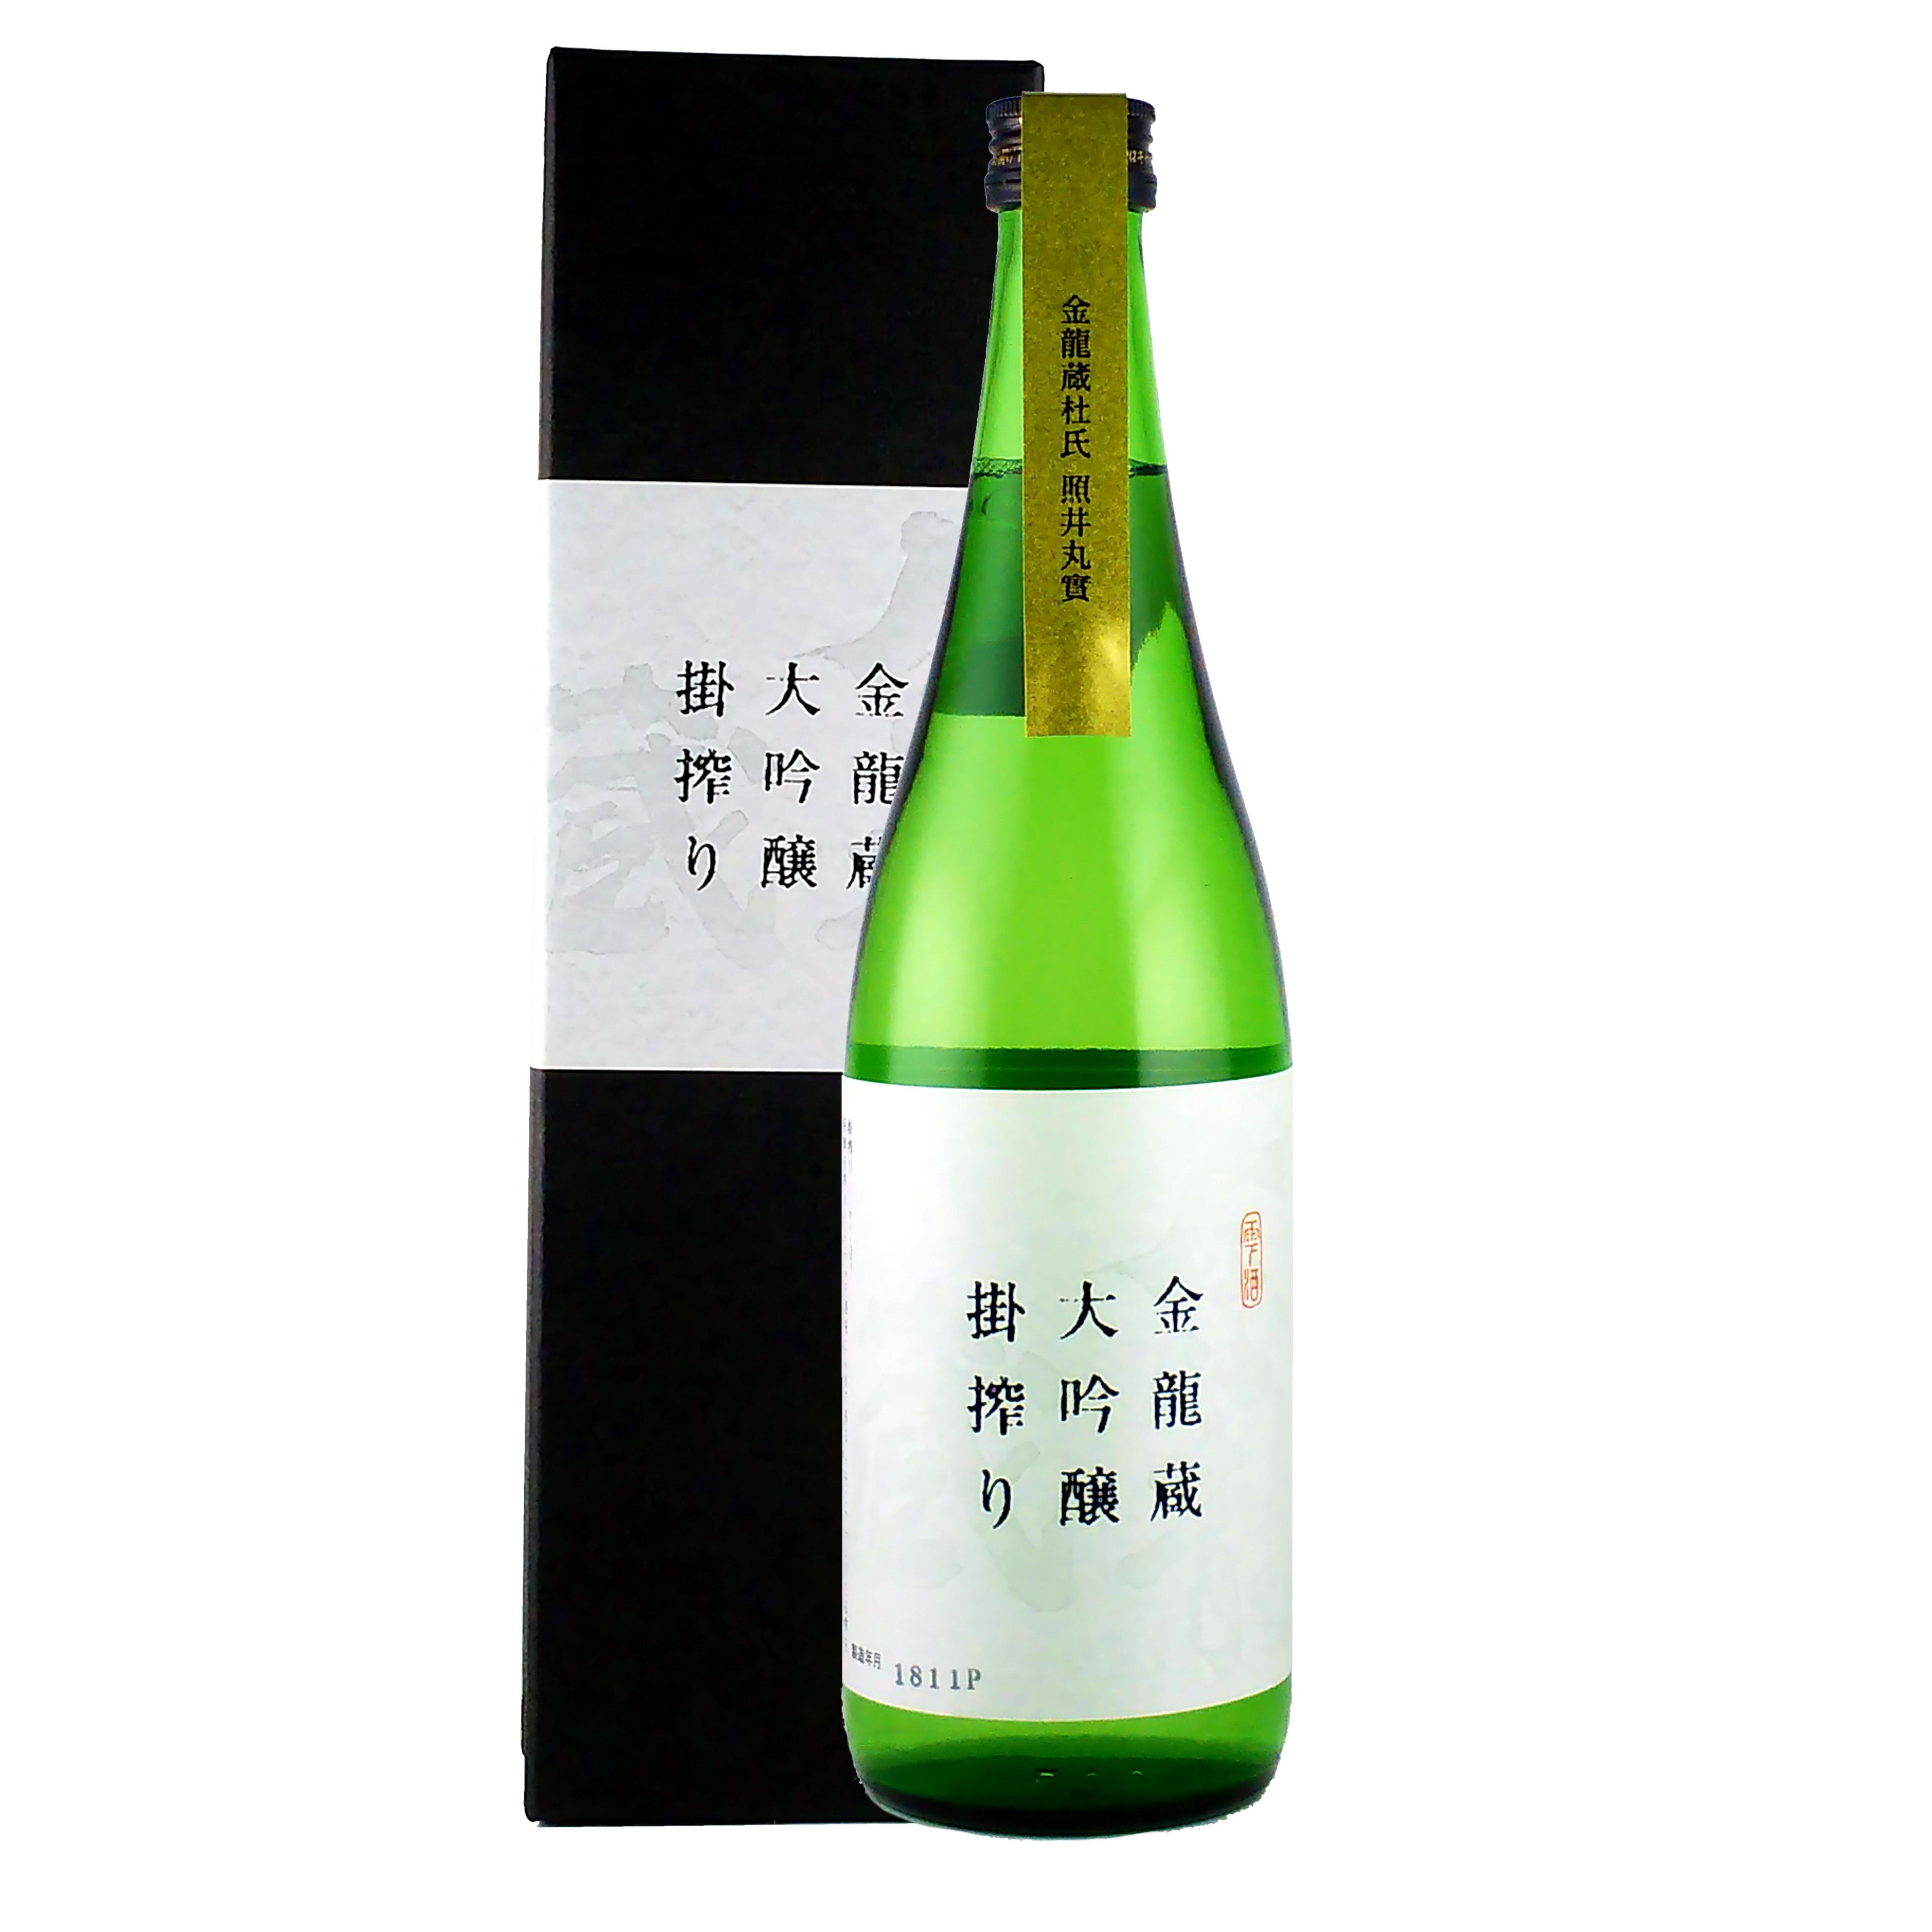 一ノ蔵 金龍 大吟醸 掛搾り 720ml